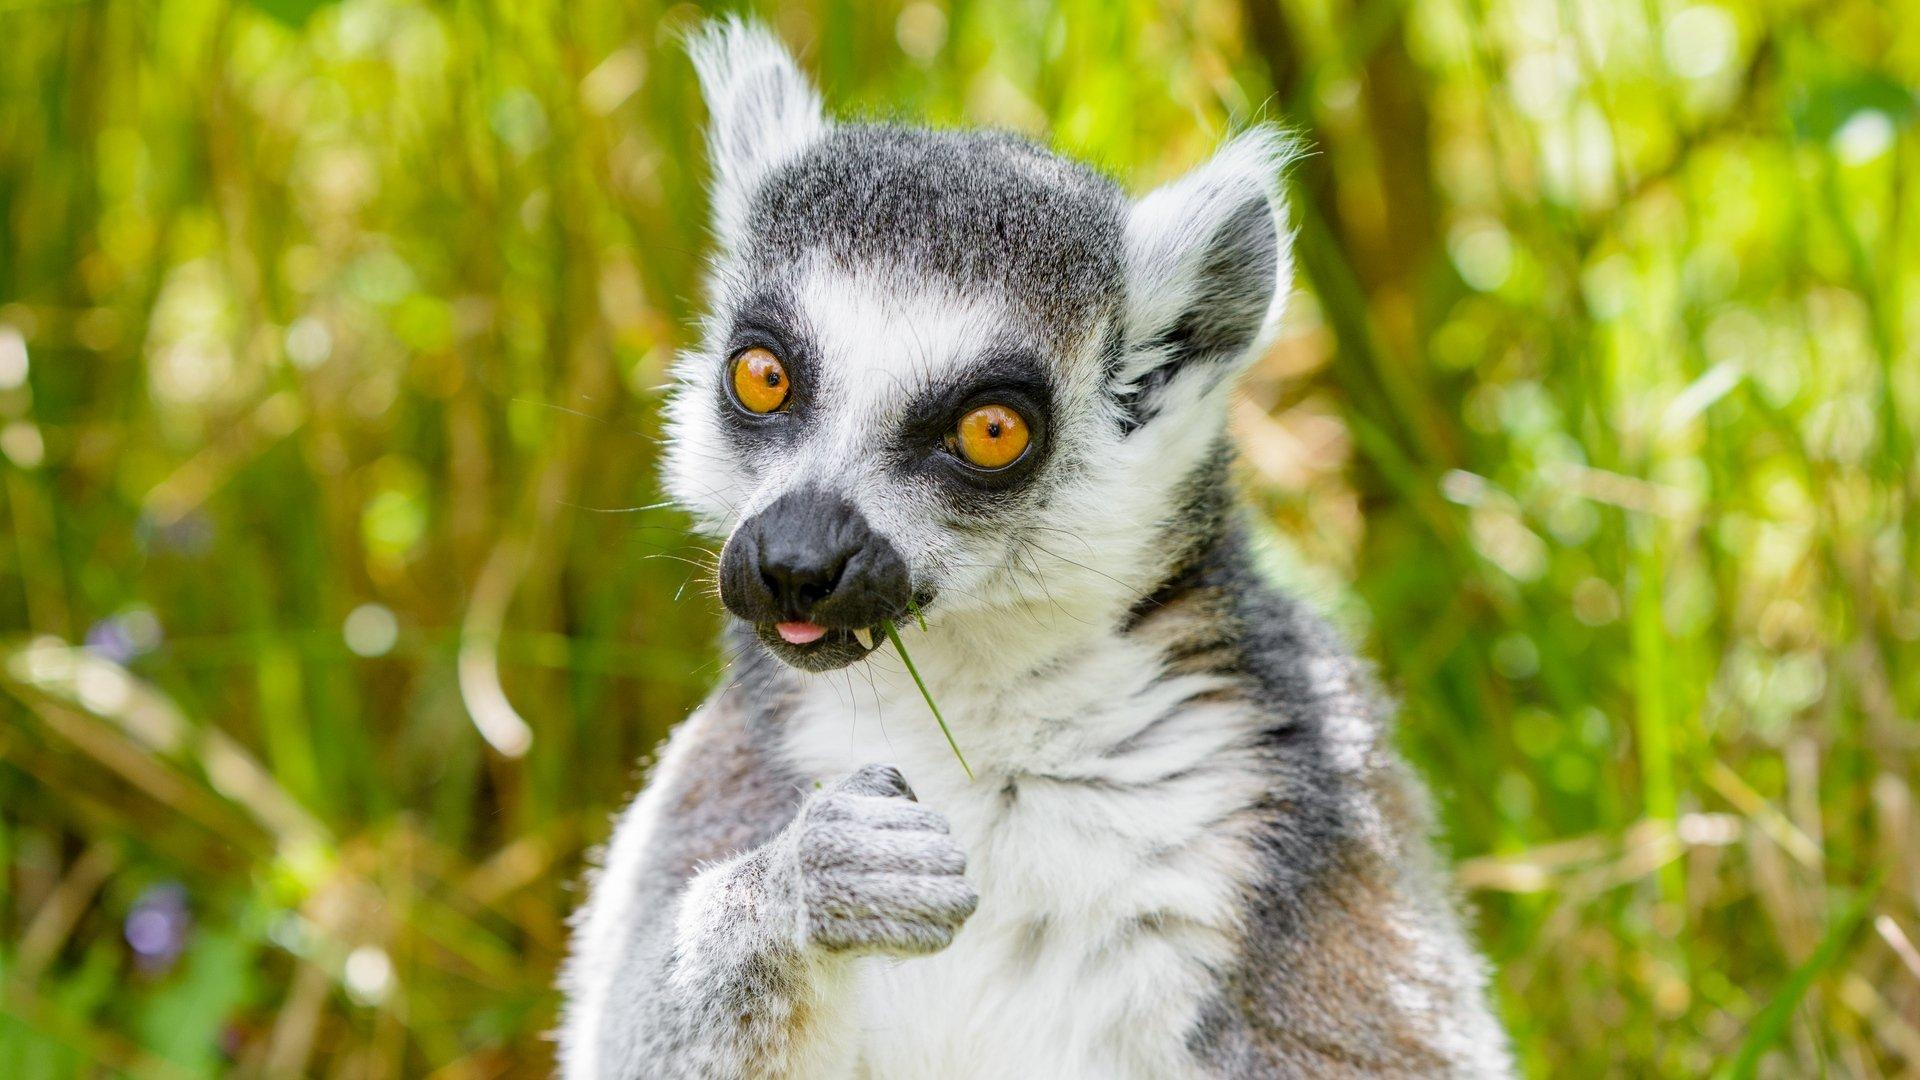 Lemur HD Desktop Wallpaper